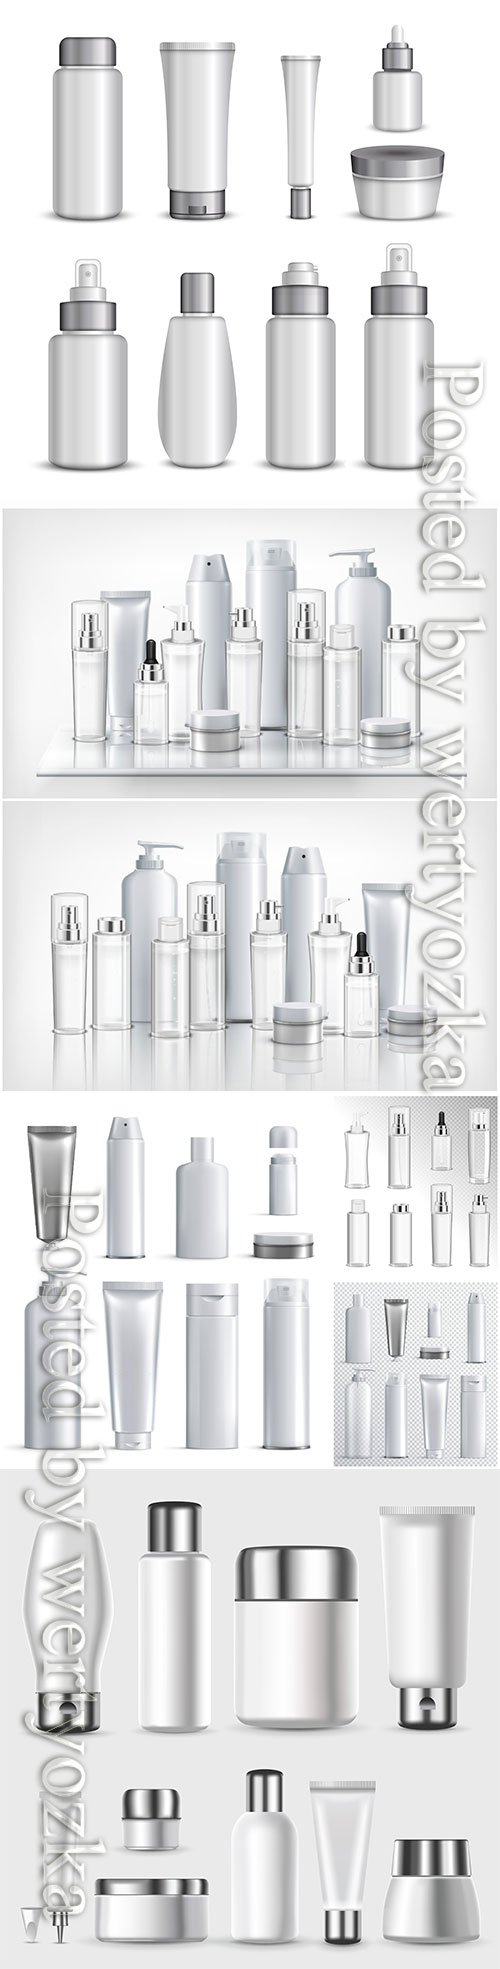 Set of cosmetics plastic bottles